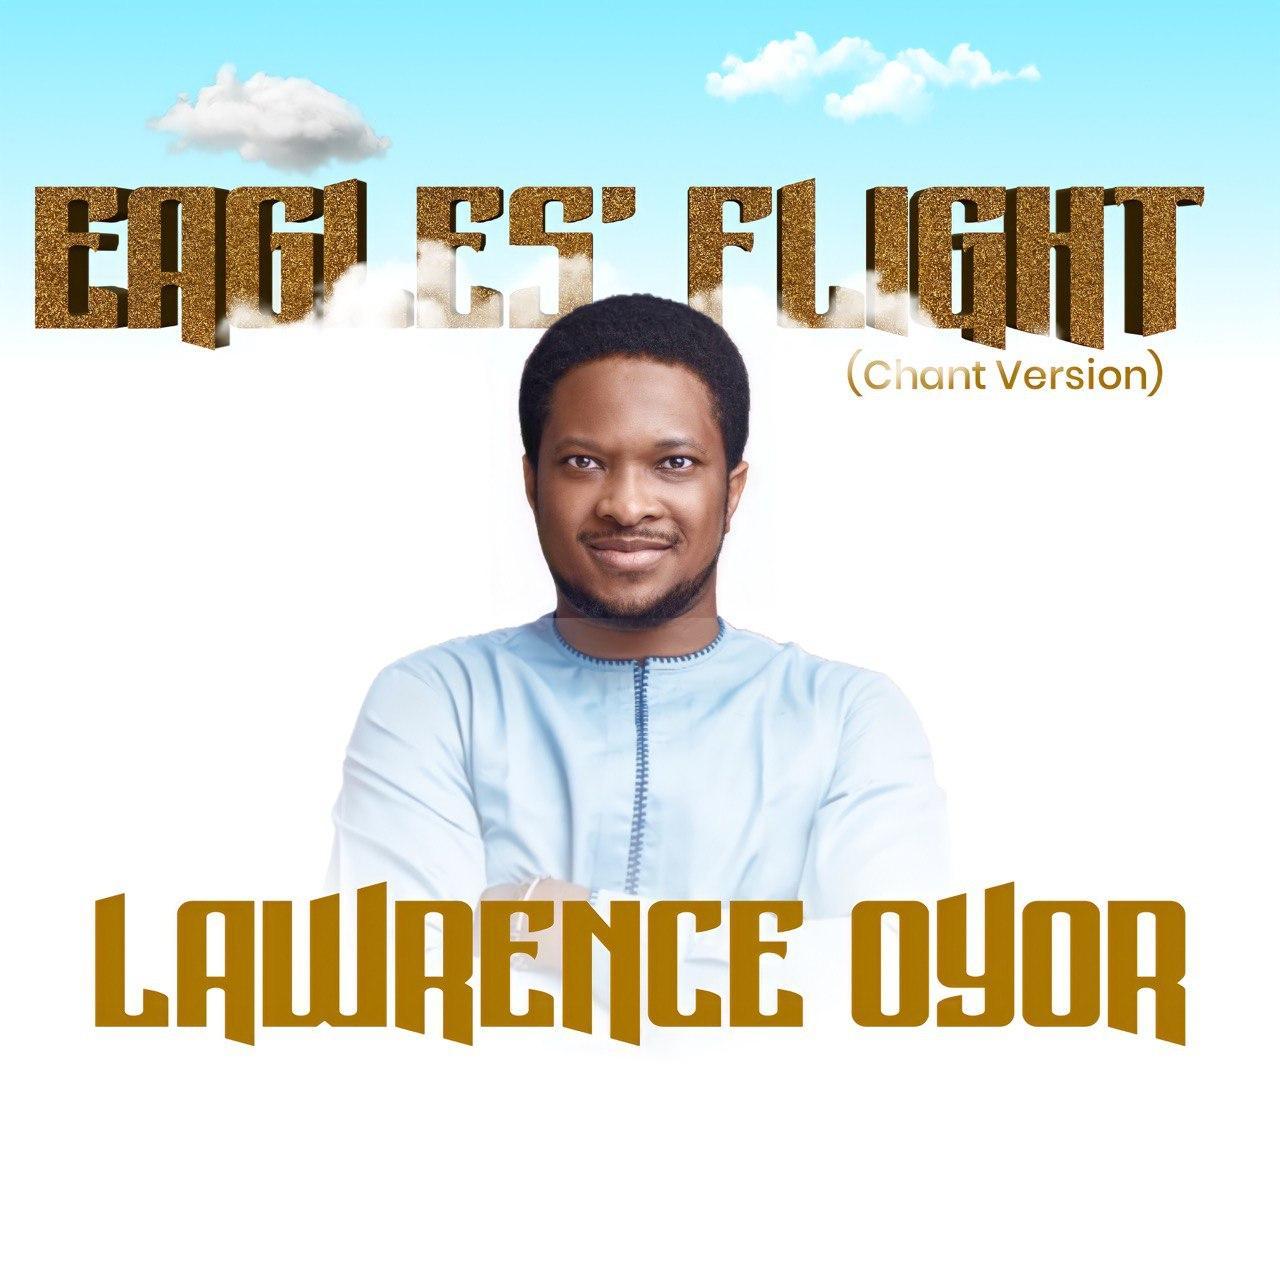 Lawrence Oyor Eagles Flight Chanrt Version